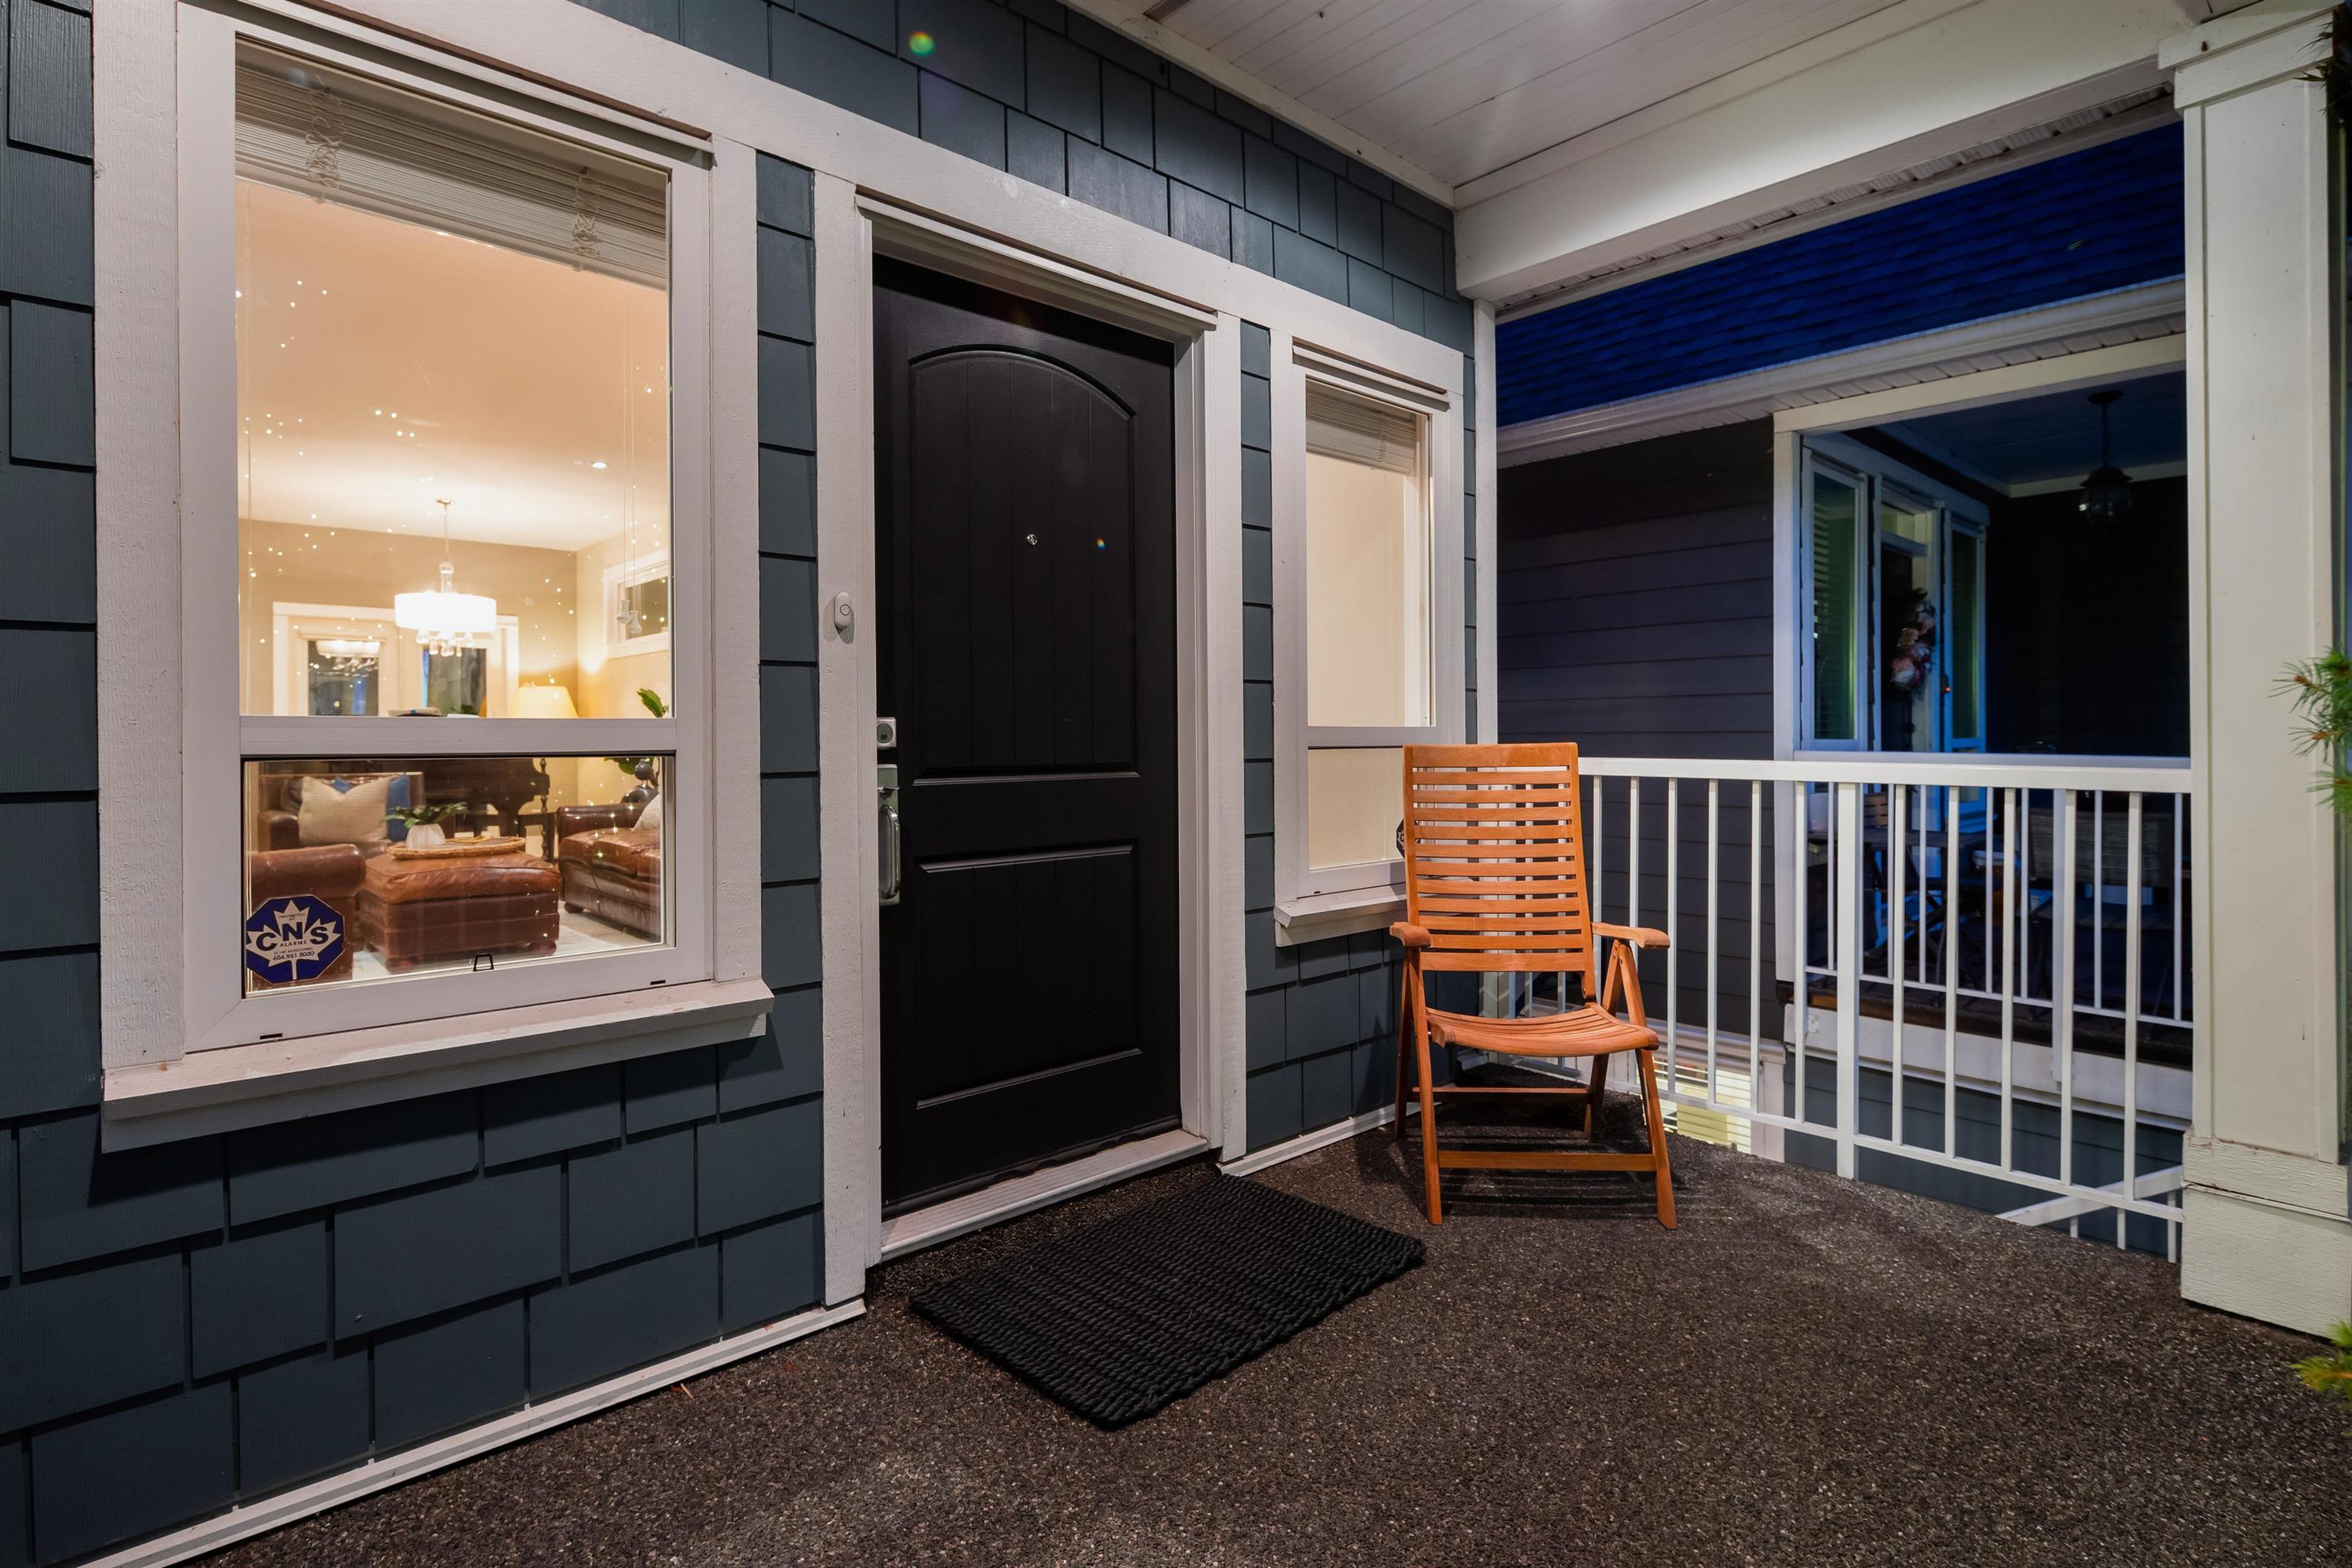 2258 WINDRIDGE DRIVE - Seymour NV House/Single Family for sale, 5 Bedrooms (R2617156) - #2